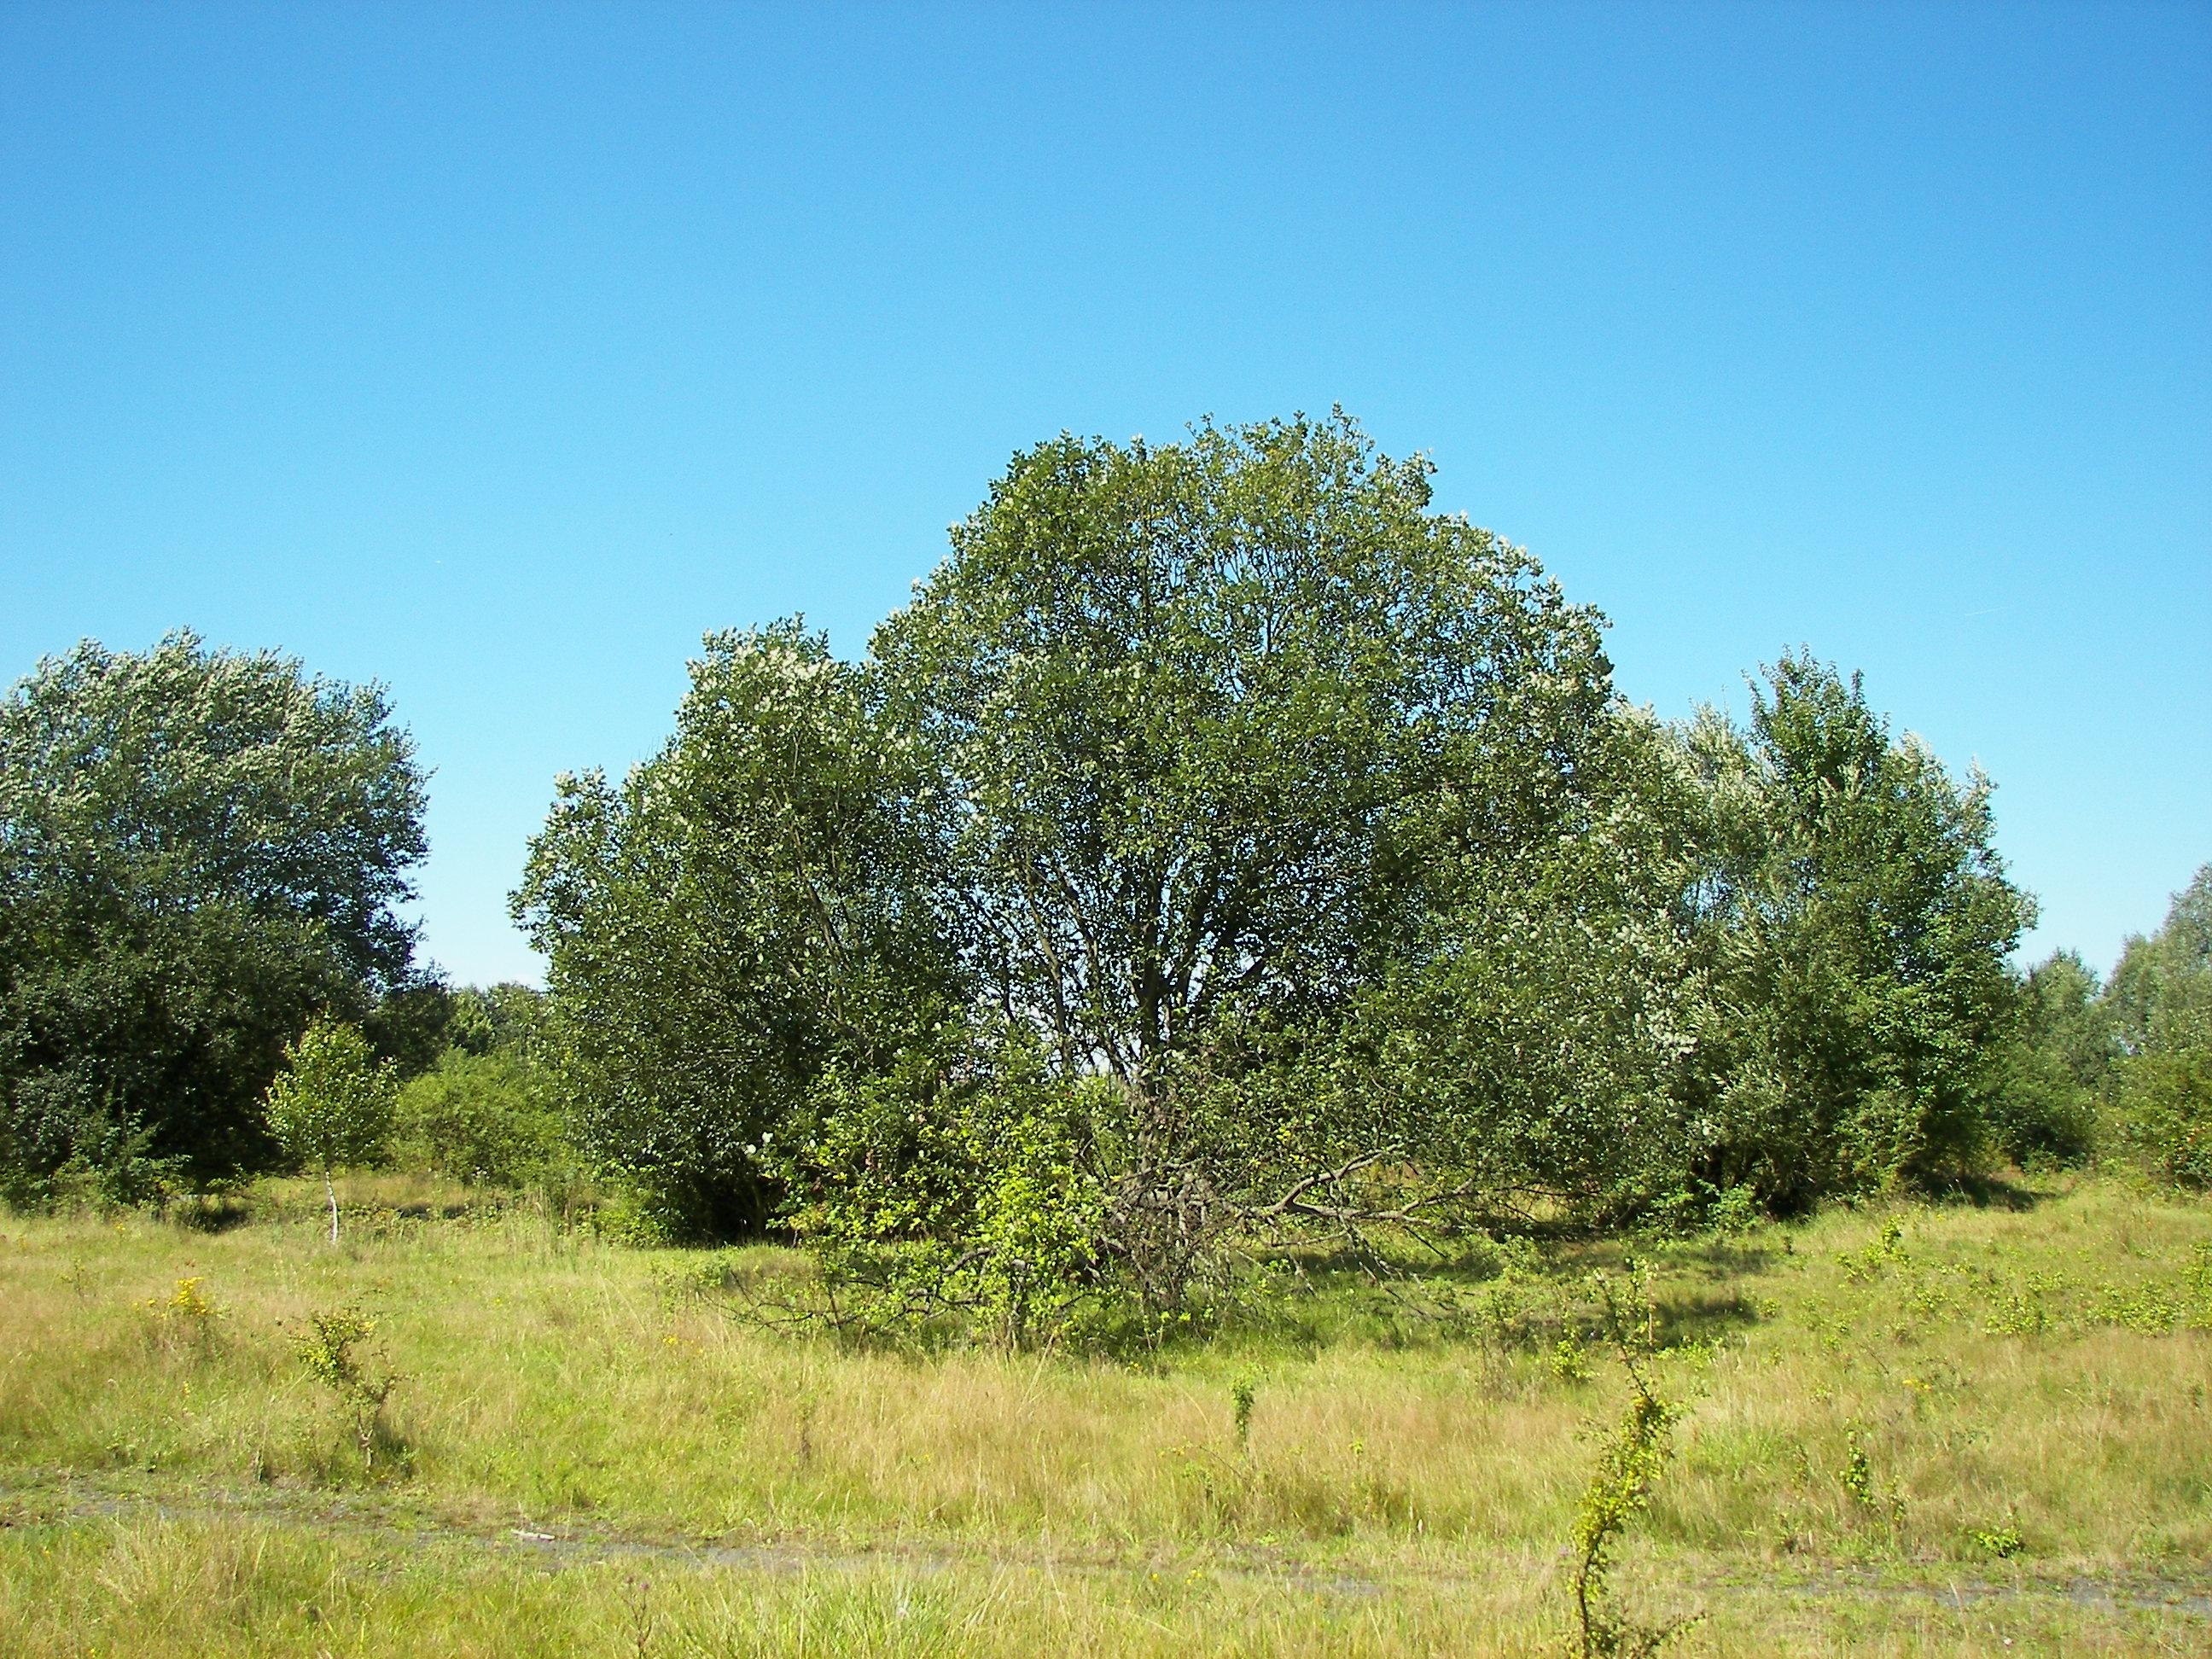 File:Salix caprea 035.jpg - Wikimedia Commons